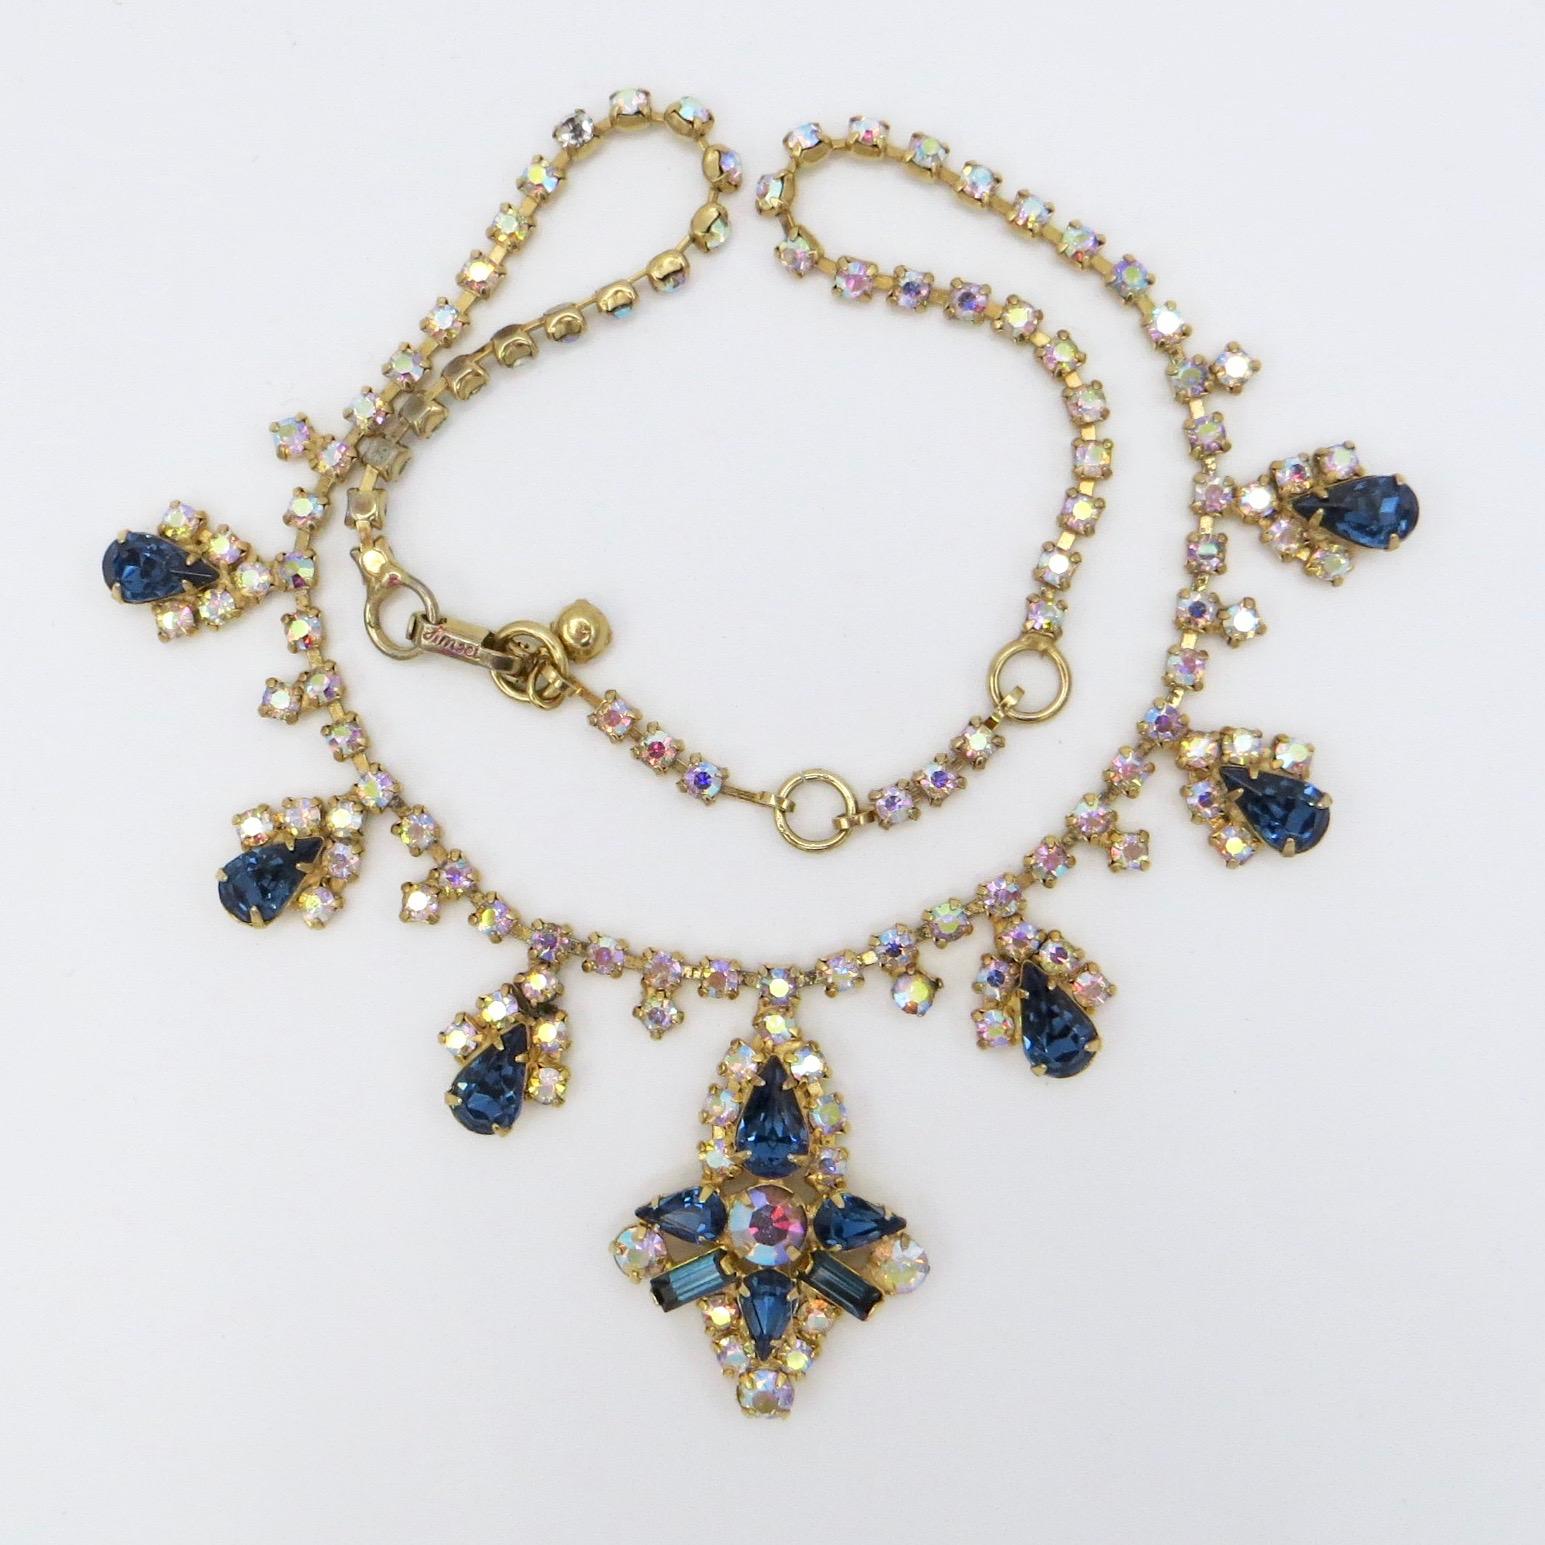 Vintage Costume Necklace